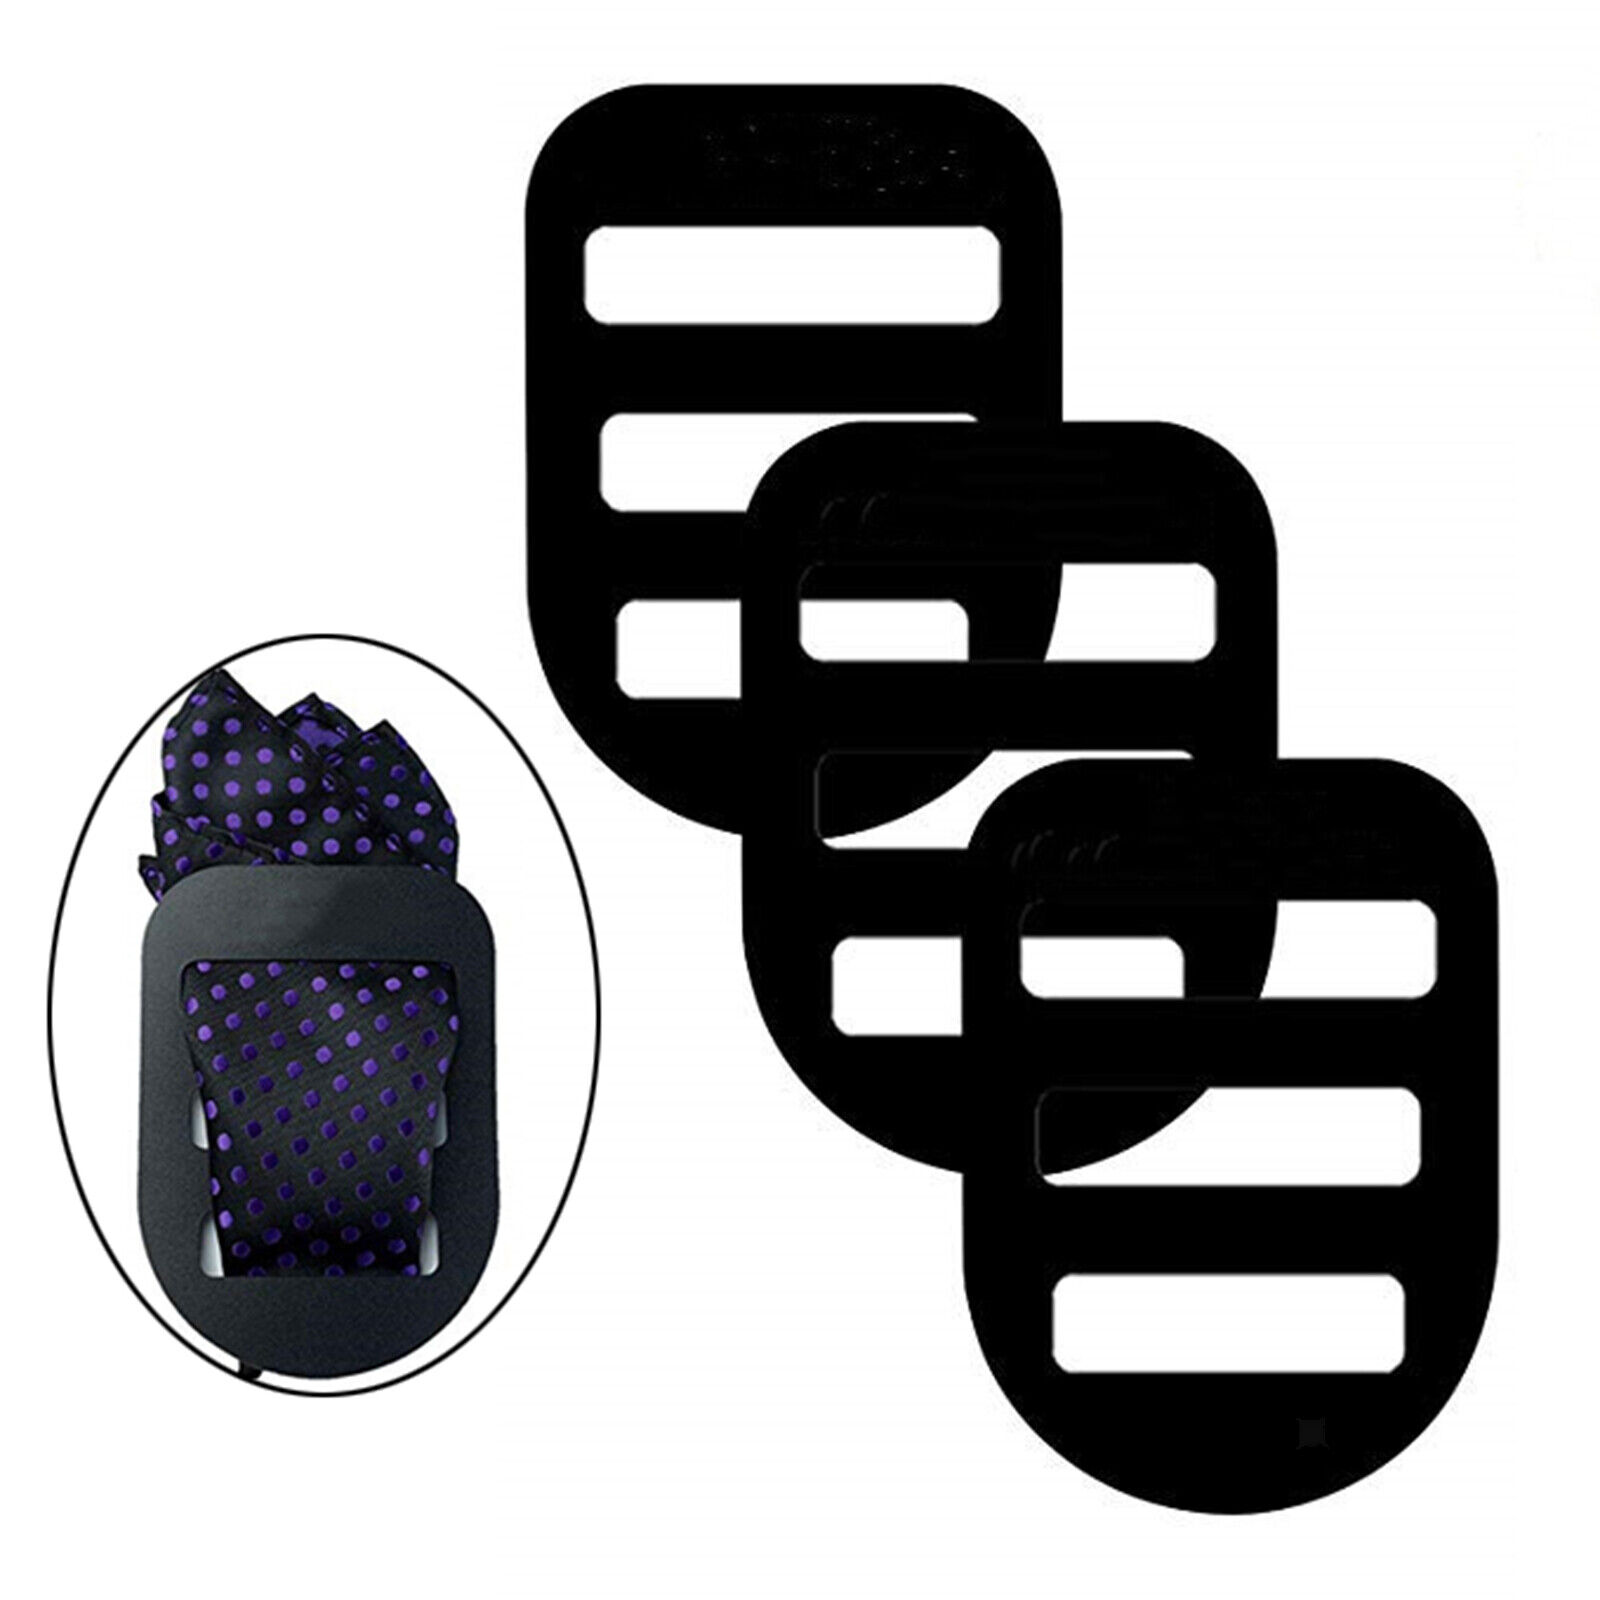 3Pack Pocket Square Holder Keeper Pocket Square Organizer Accessory Black